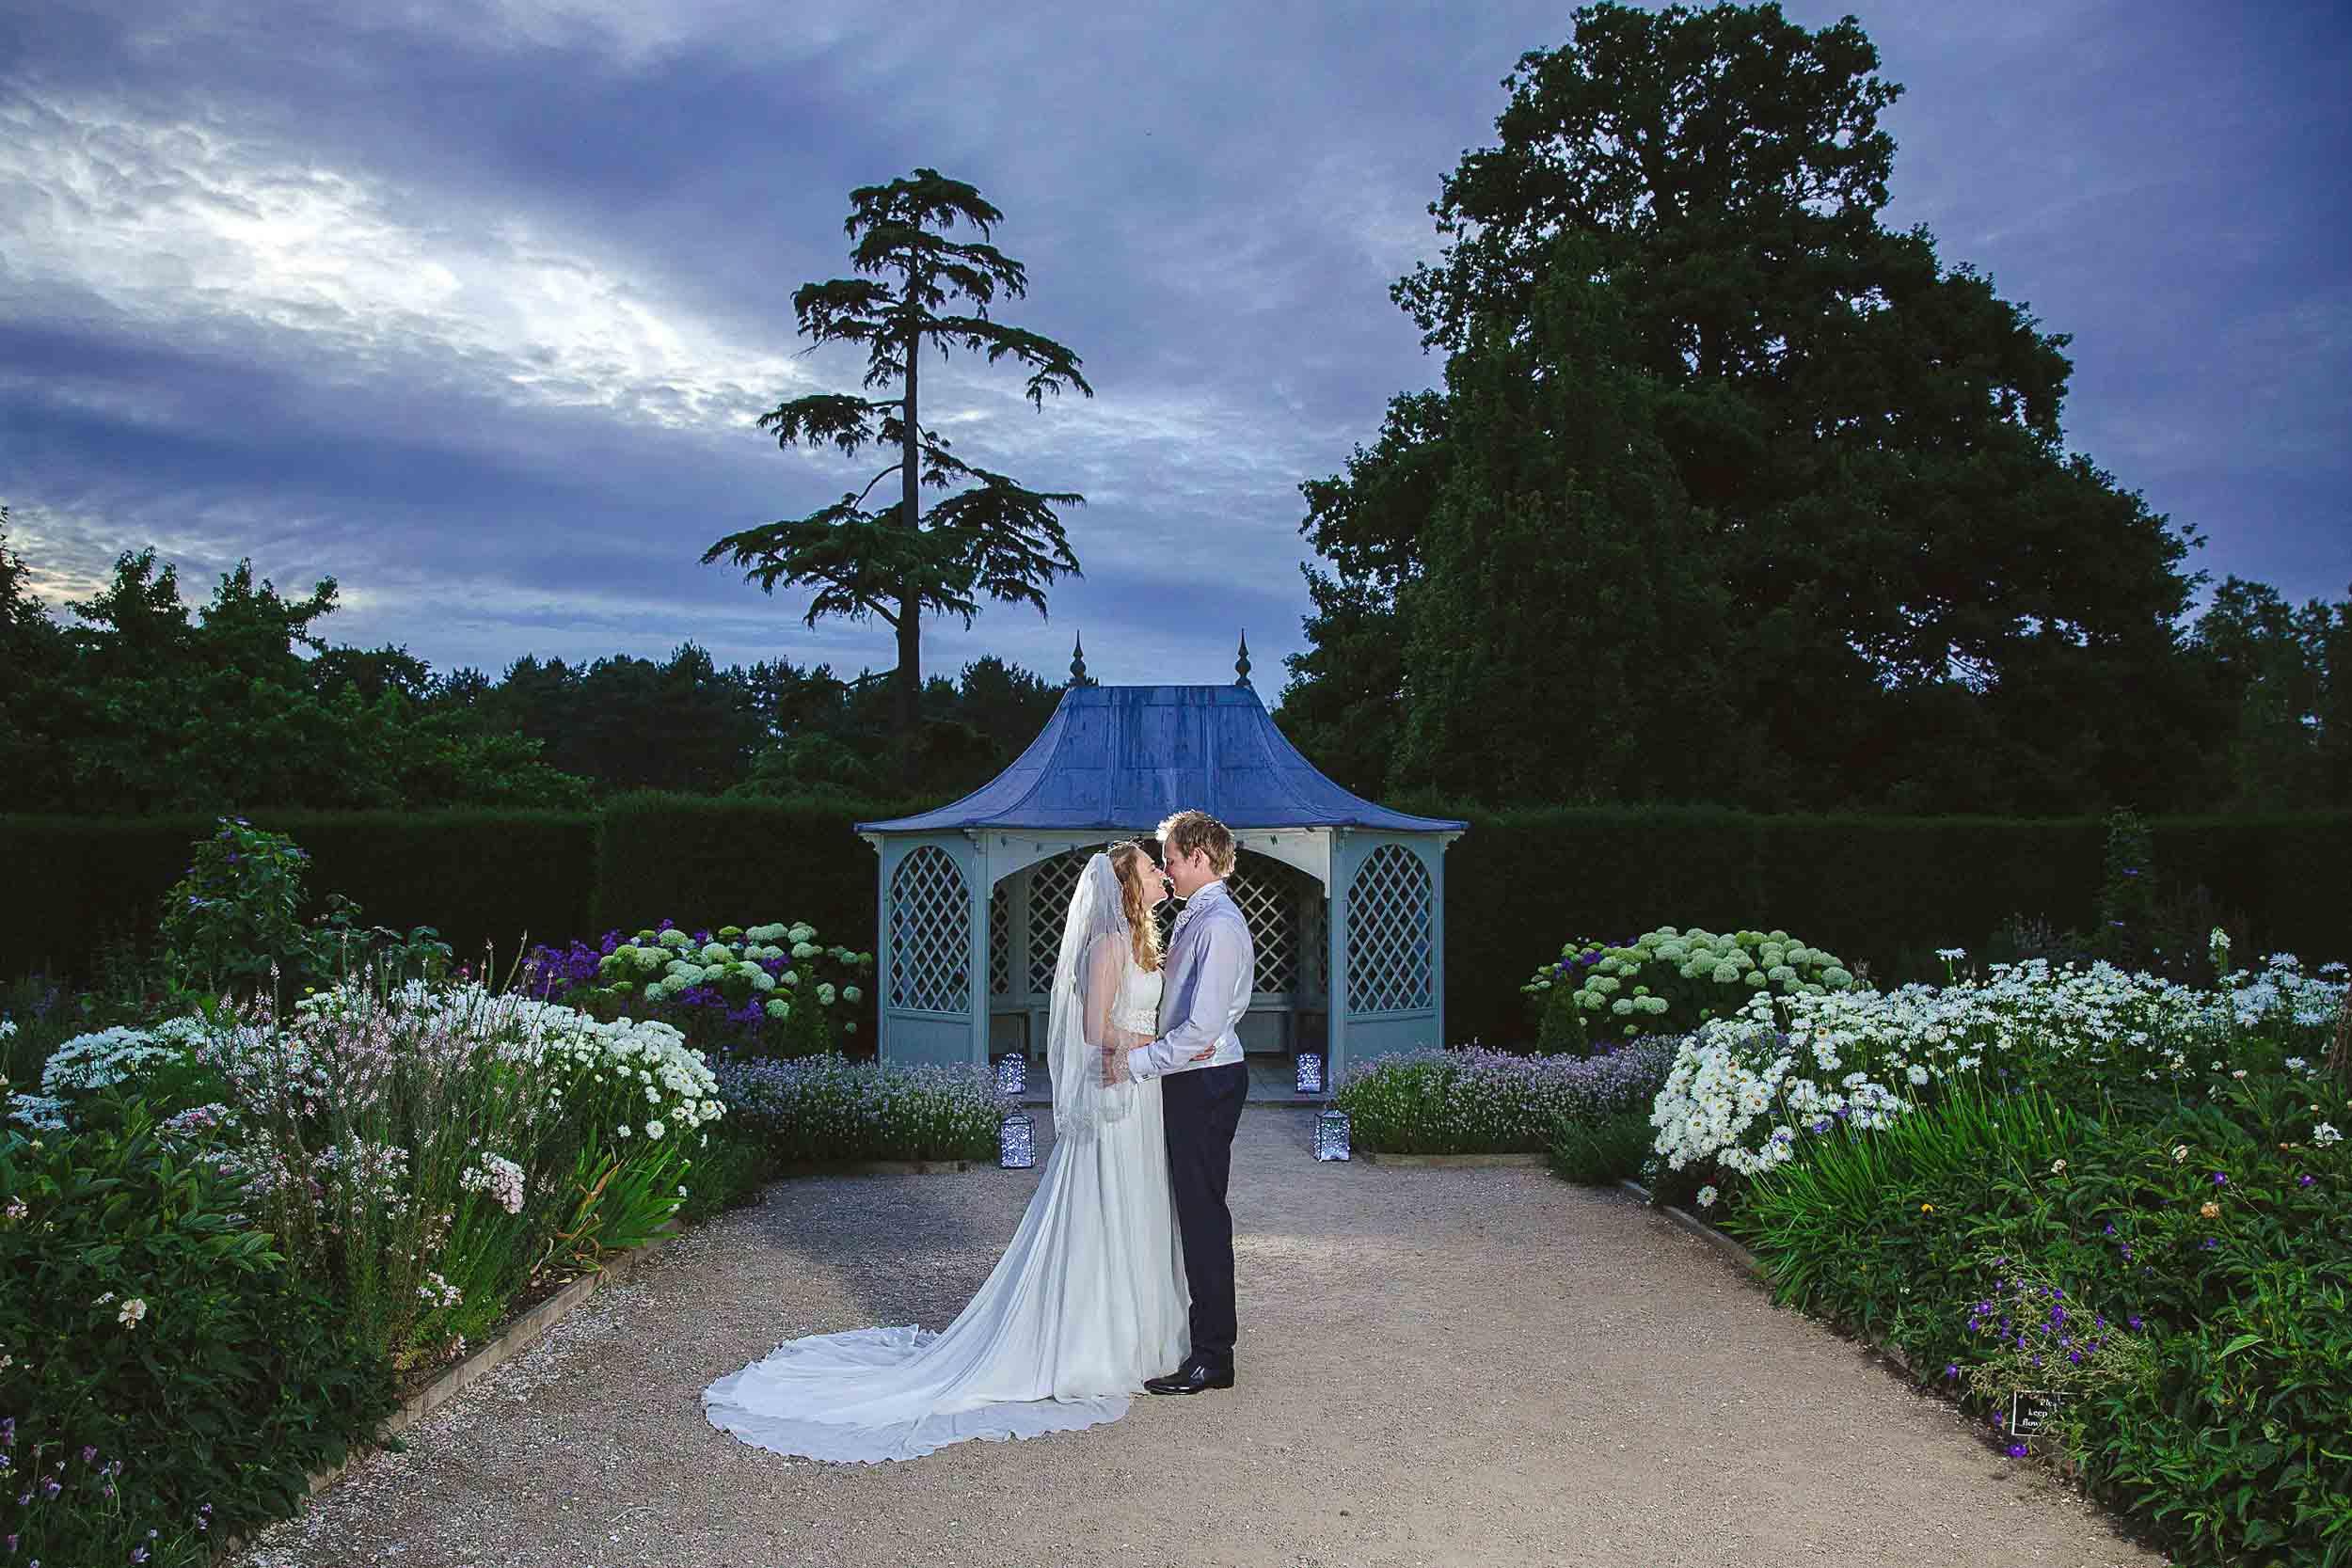 Marks-Hall-Wedding-Photographer-59.jpg